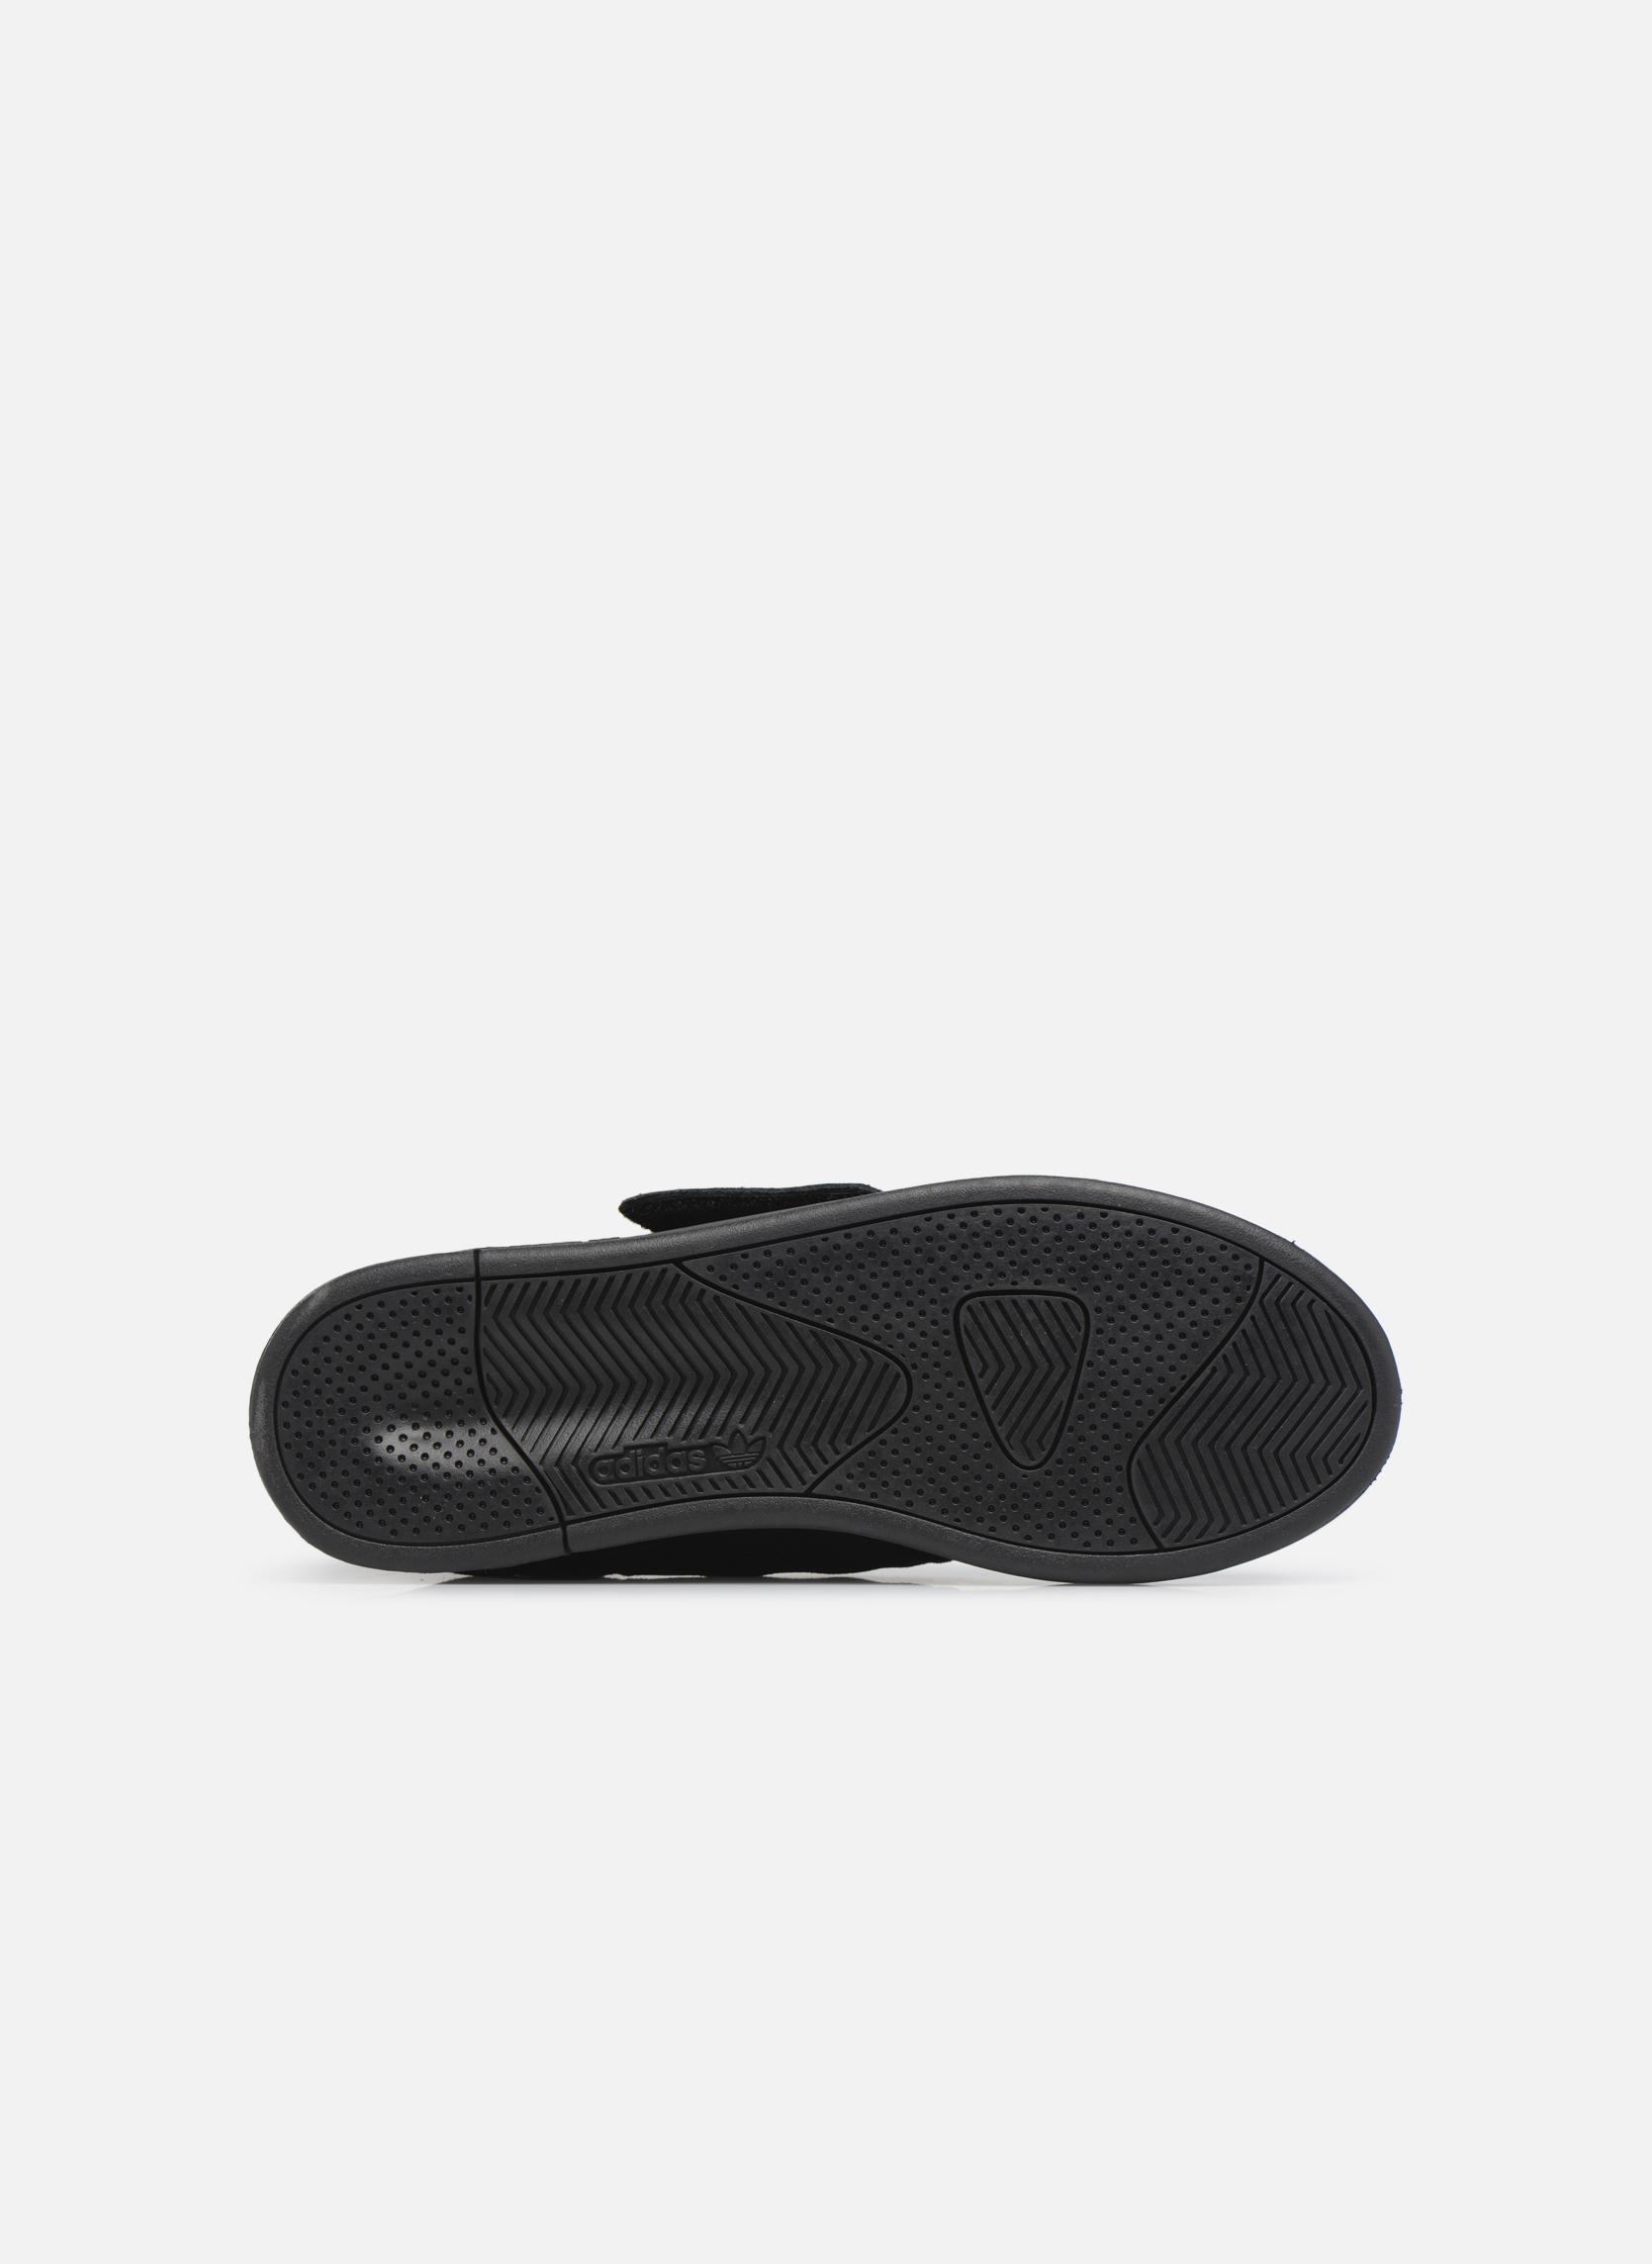 Baskets Adidas Originals Tubular Invader Strap Noir vue haut